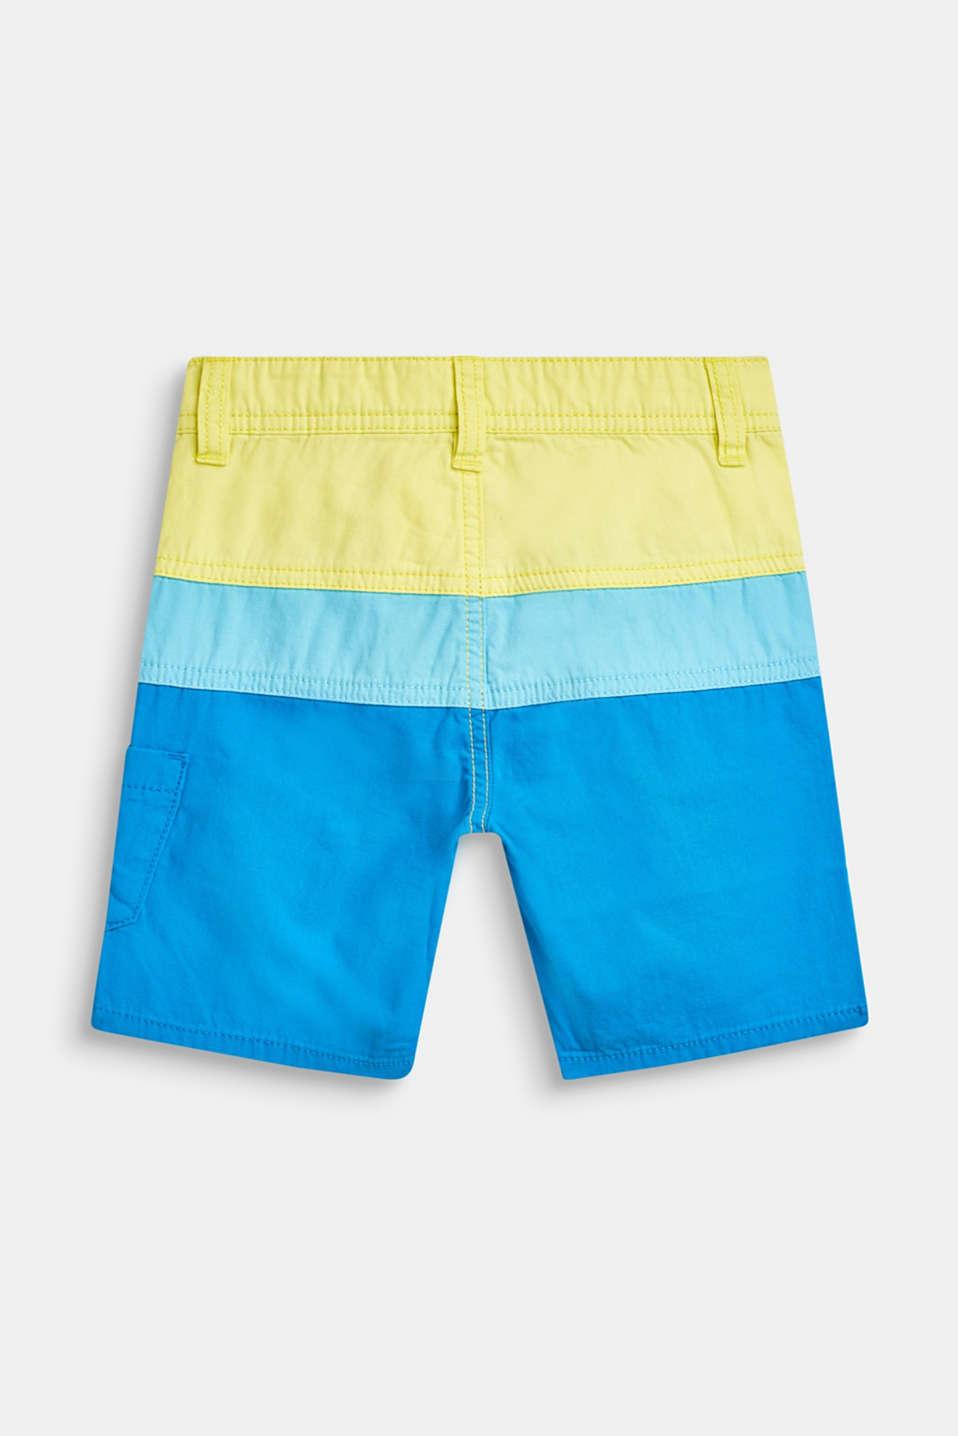 Bermudas in a colour block design, 100% cotton, BRIGHT BLUE, detail image number 1